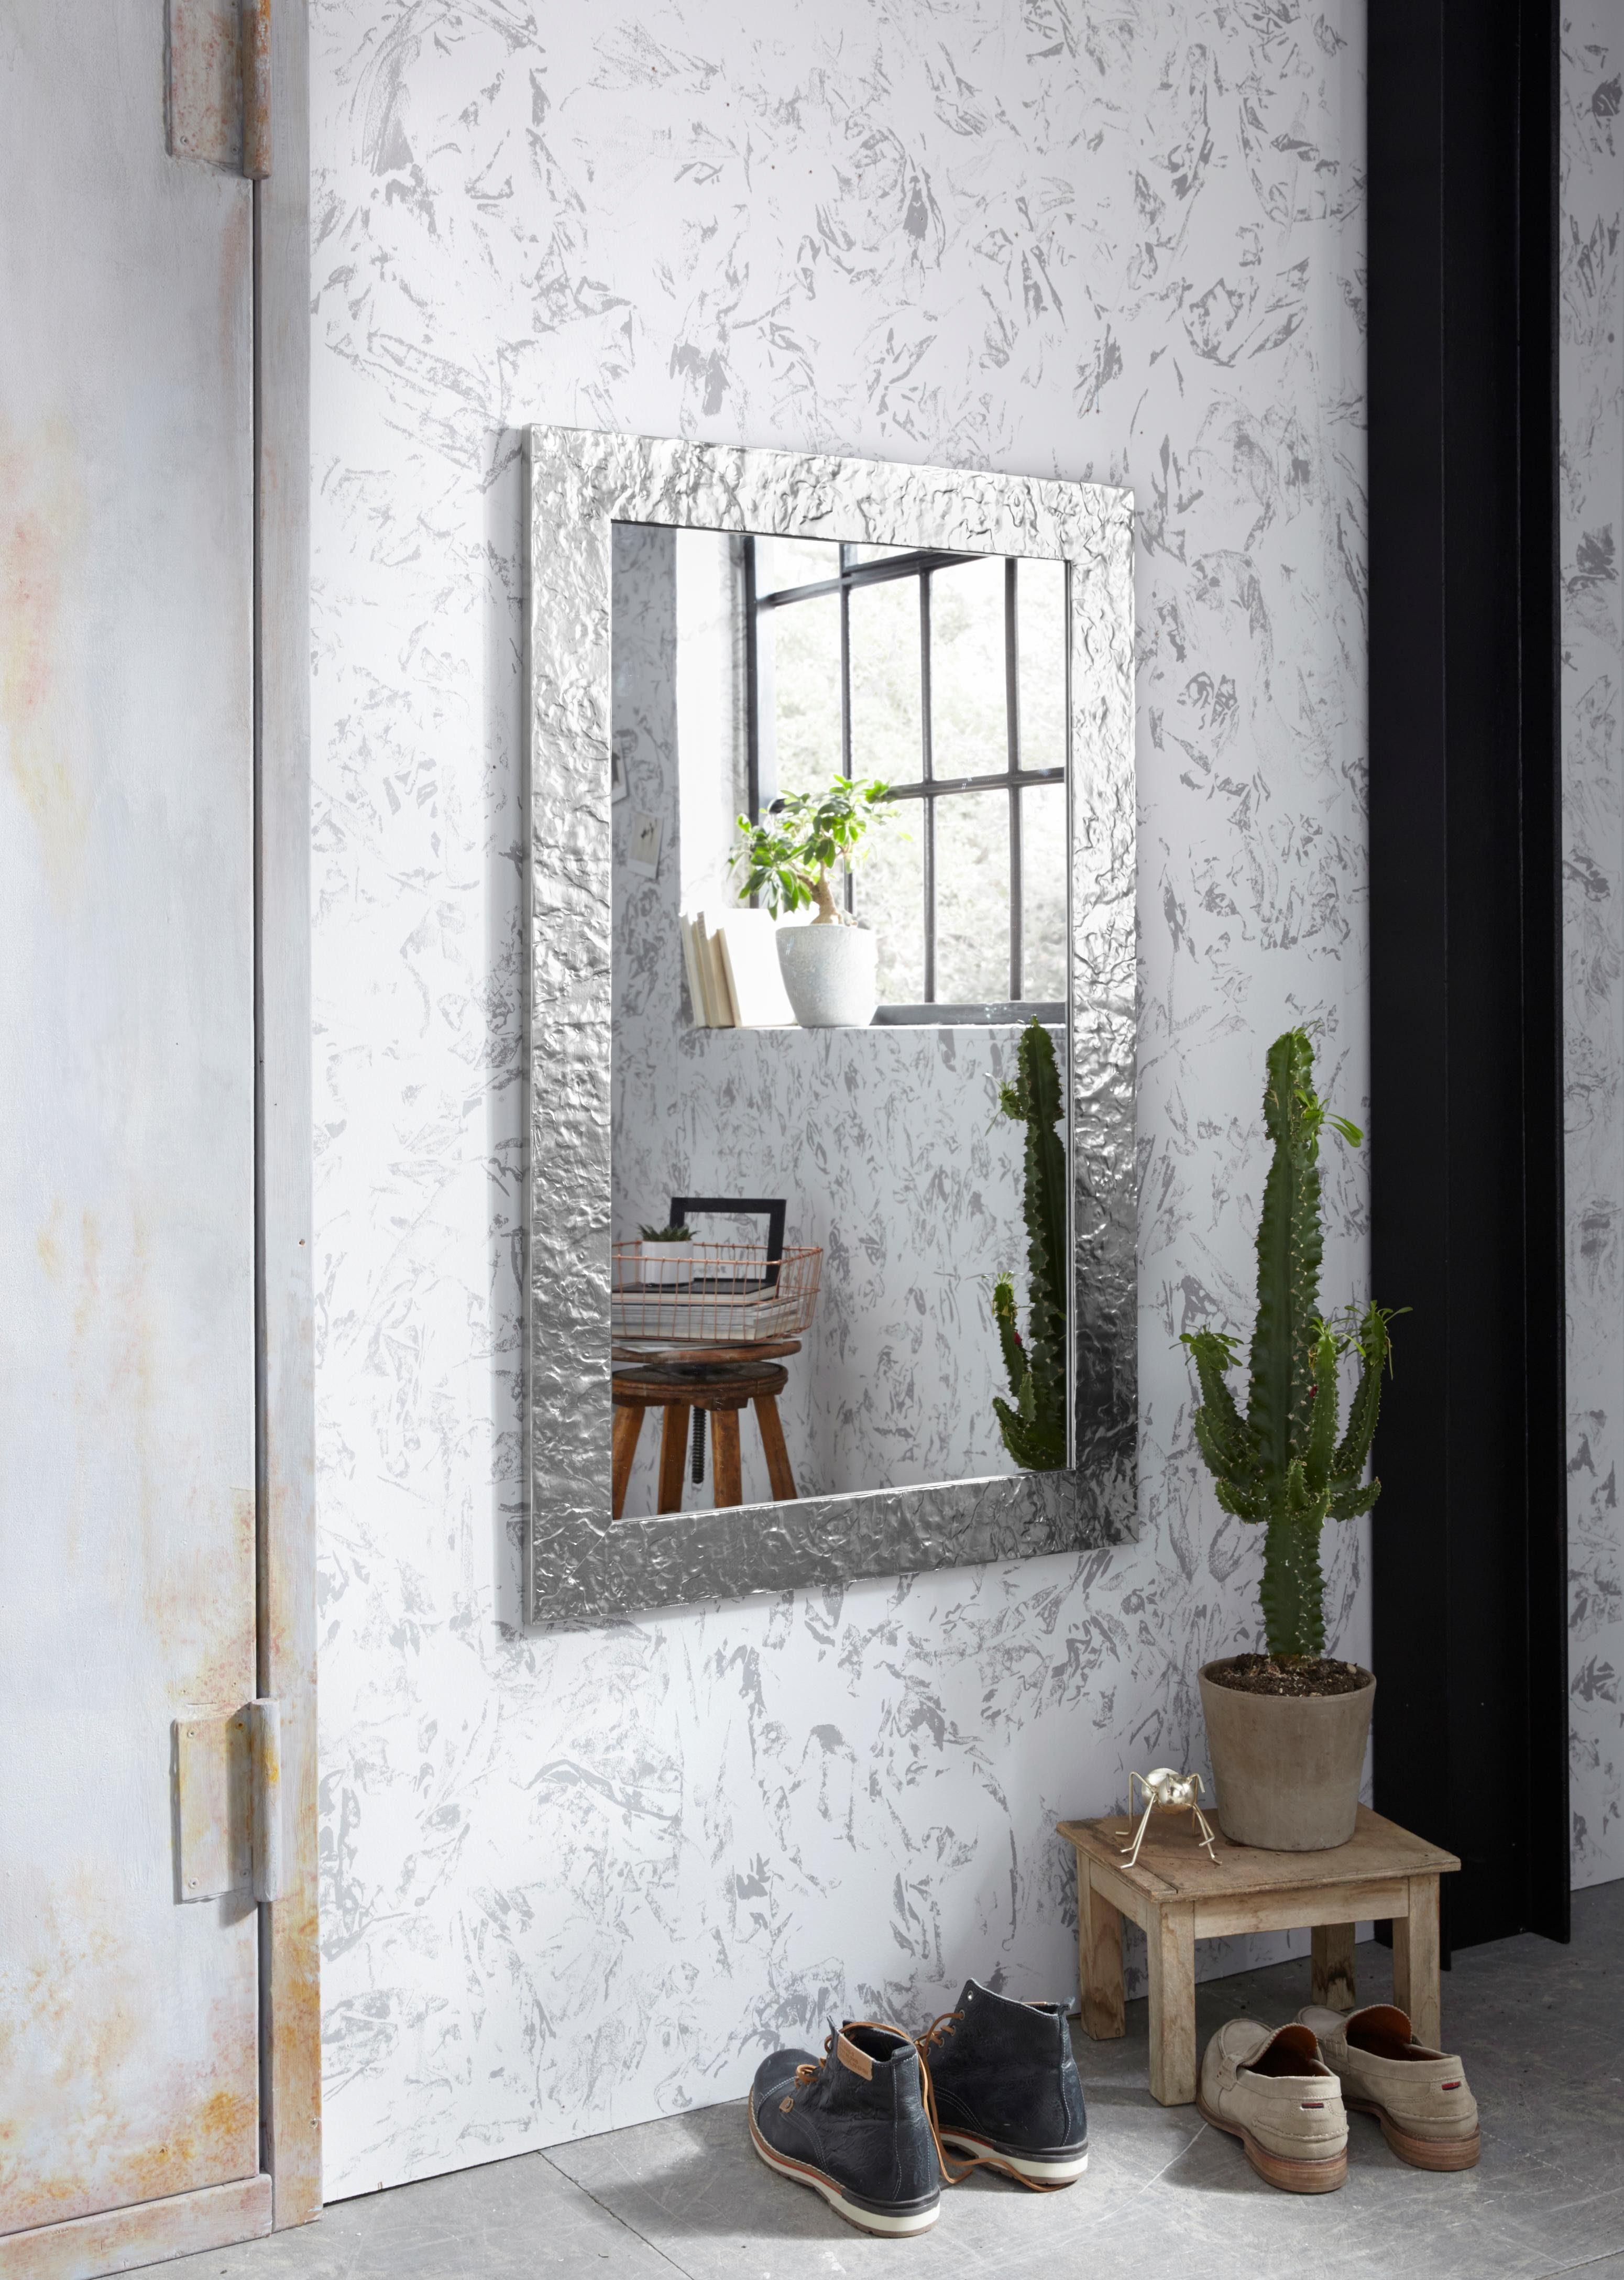 Home affaire, Wandspiegel, 72/112 cm